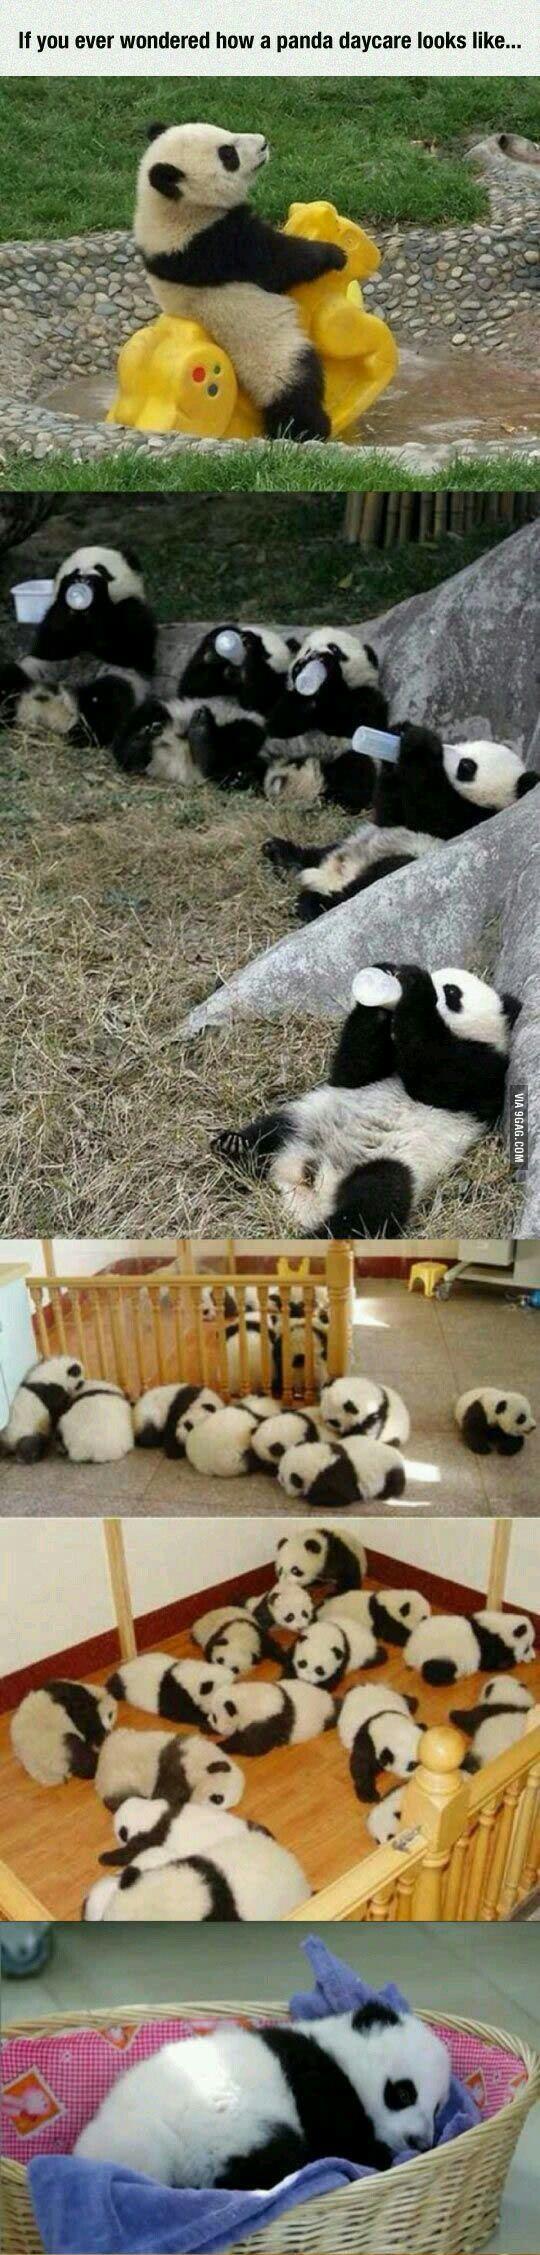 Panda daycare - 9GAG